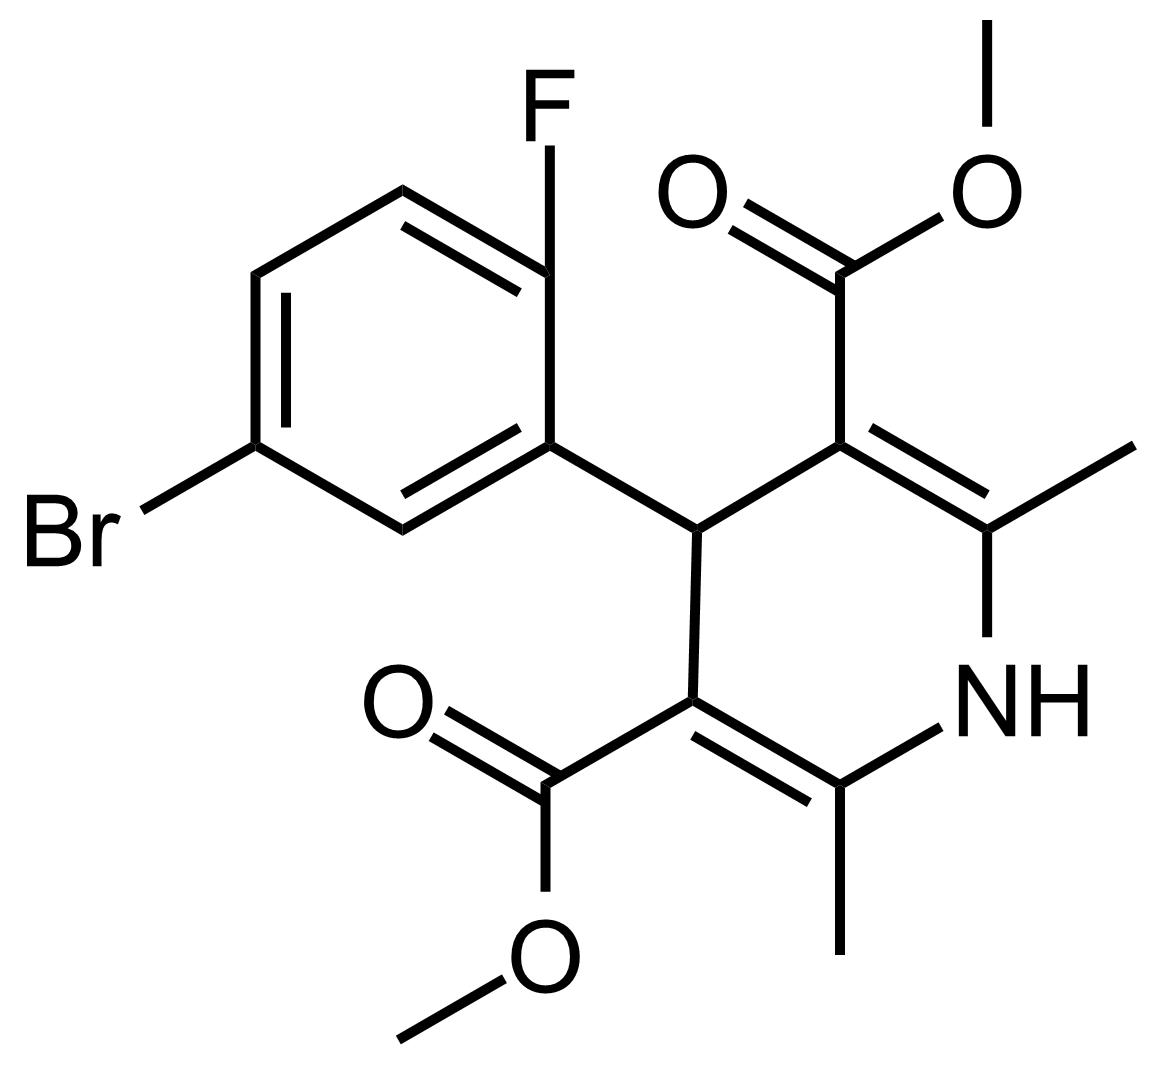 Structure of Dimethyl 4-(5-bromo-2-fluorophenyl)-2,6-dimethyl-1,4-dihydropyridine-3,5-dicarboxylate